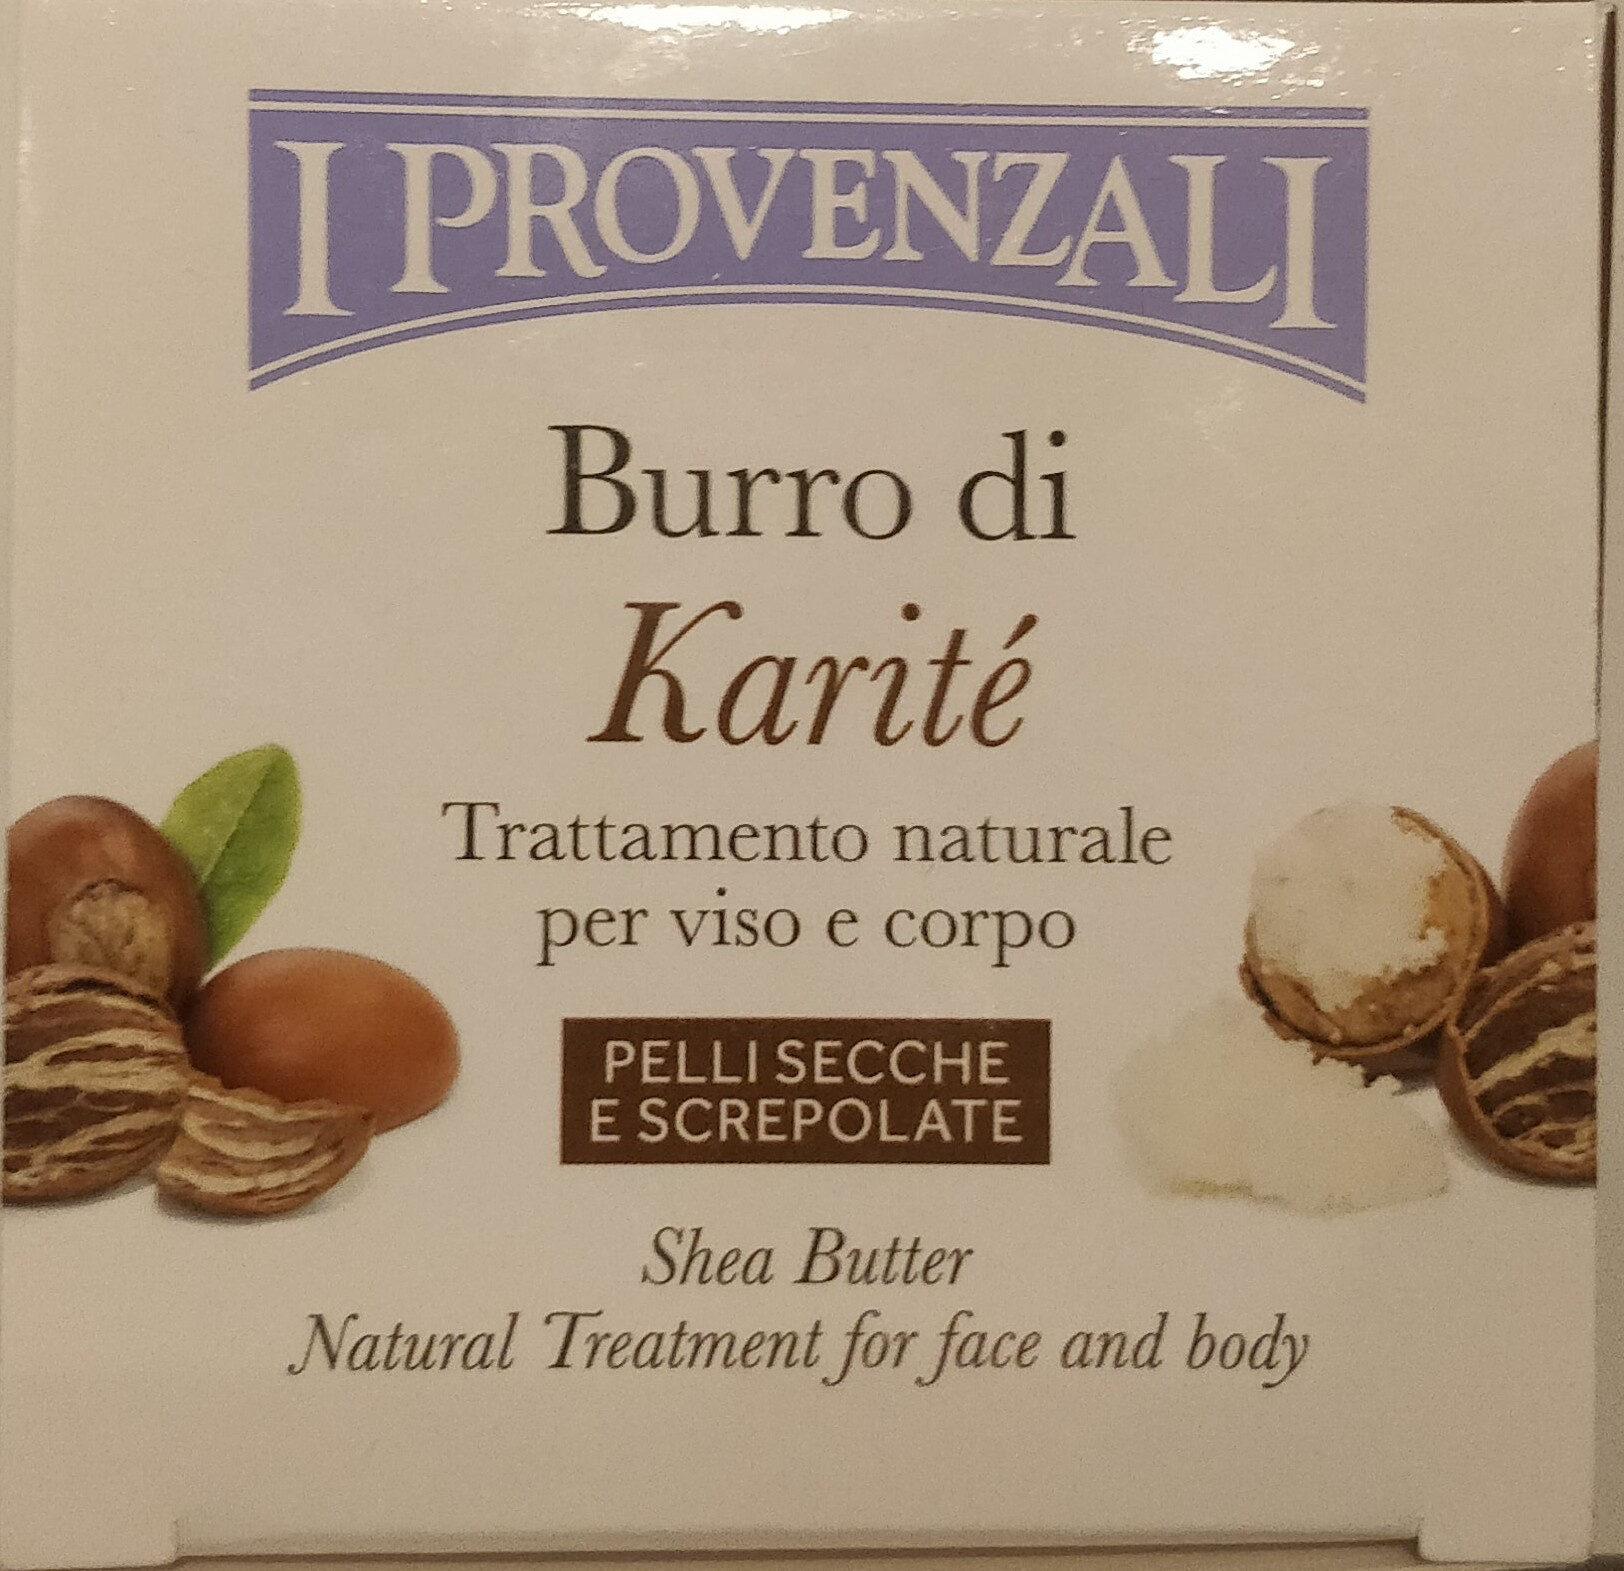 Burro di karité - Product - it